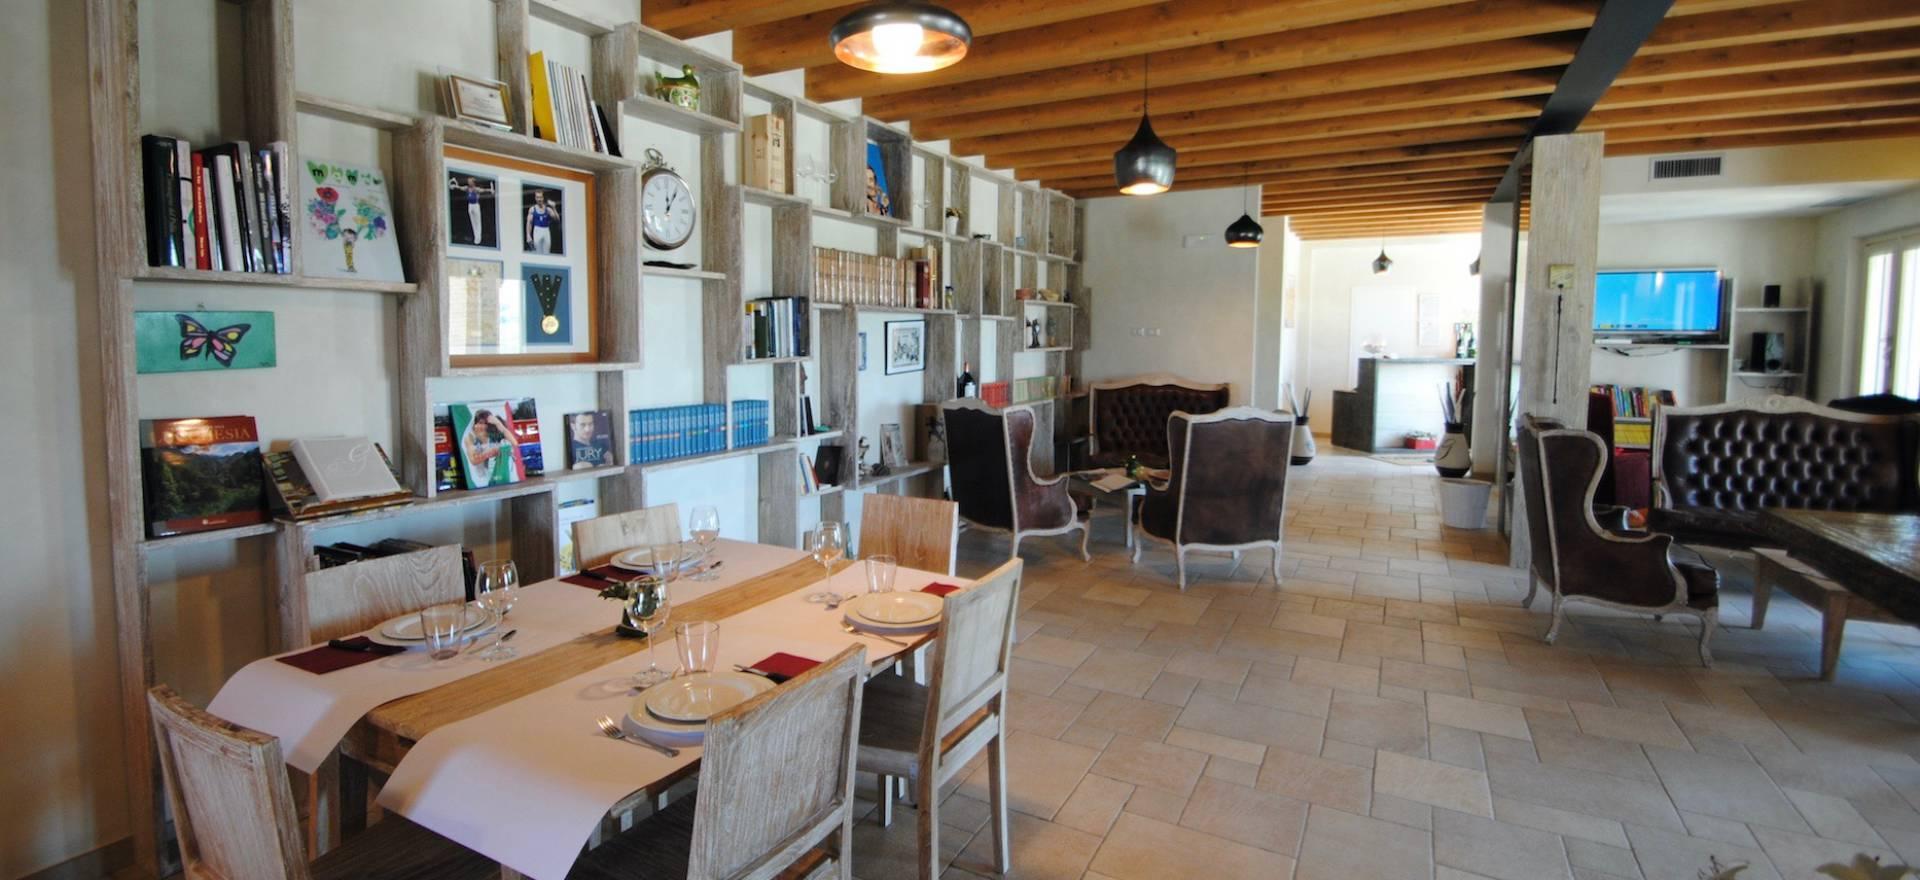 Mooie agriturismo in Marche met restaurant